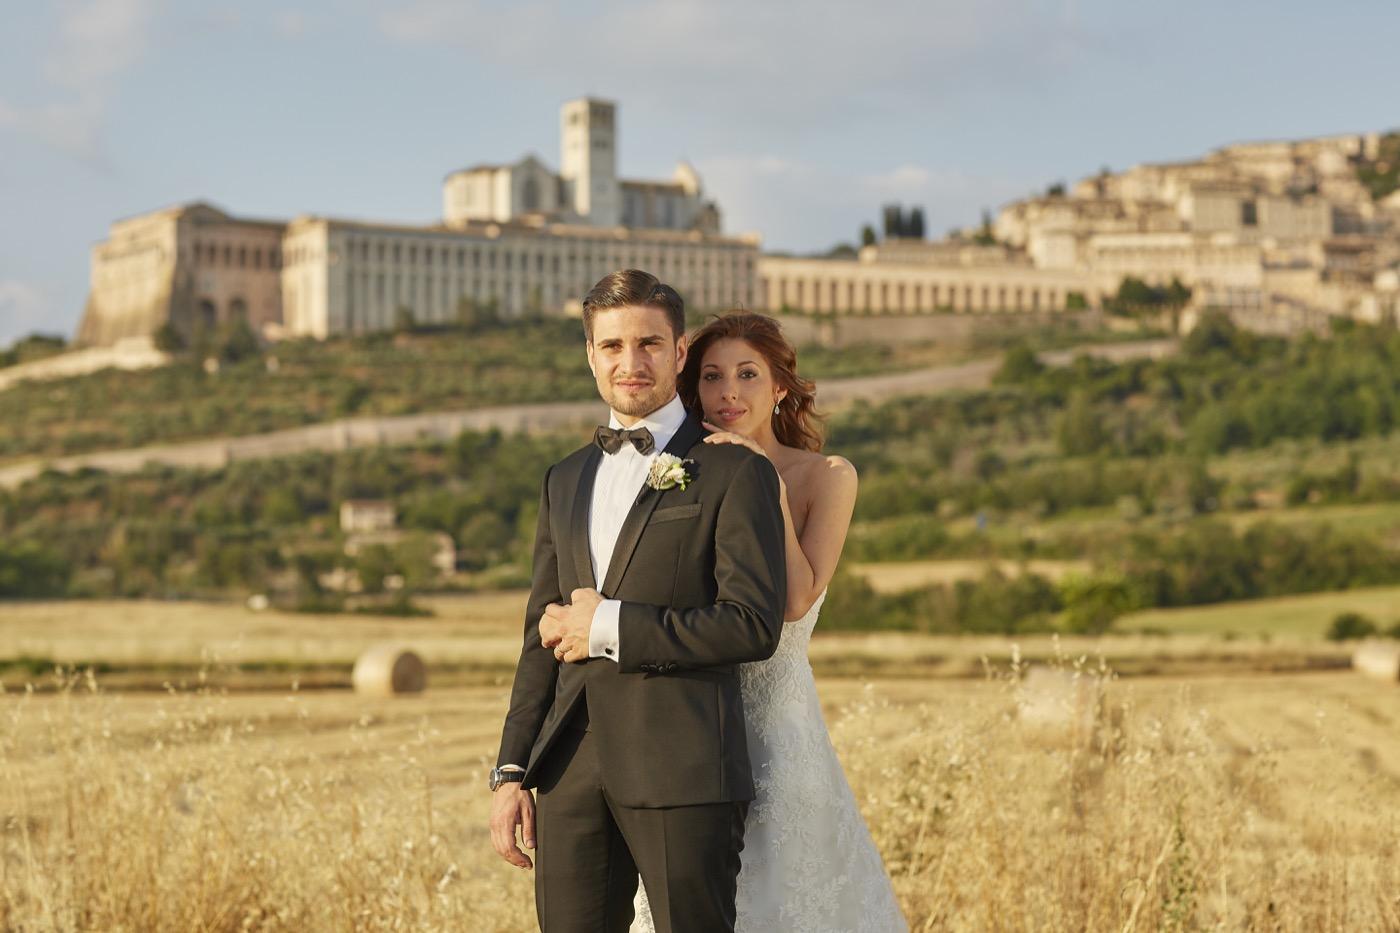 Claudio-Coppola-wedding-photographer-abbazia-7-frati-piegaro-63